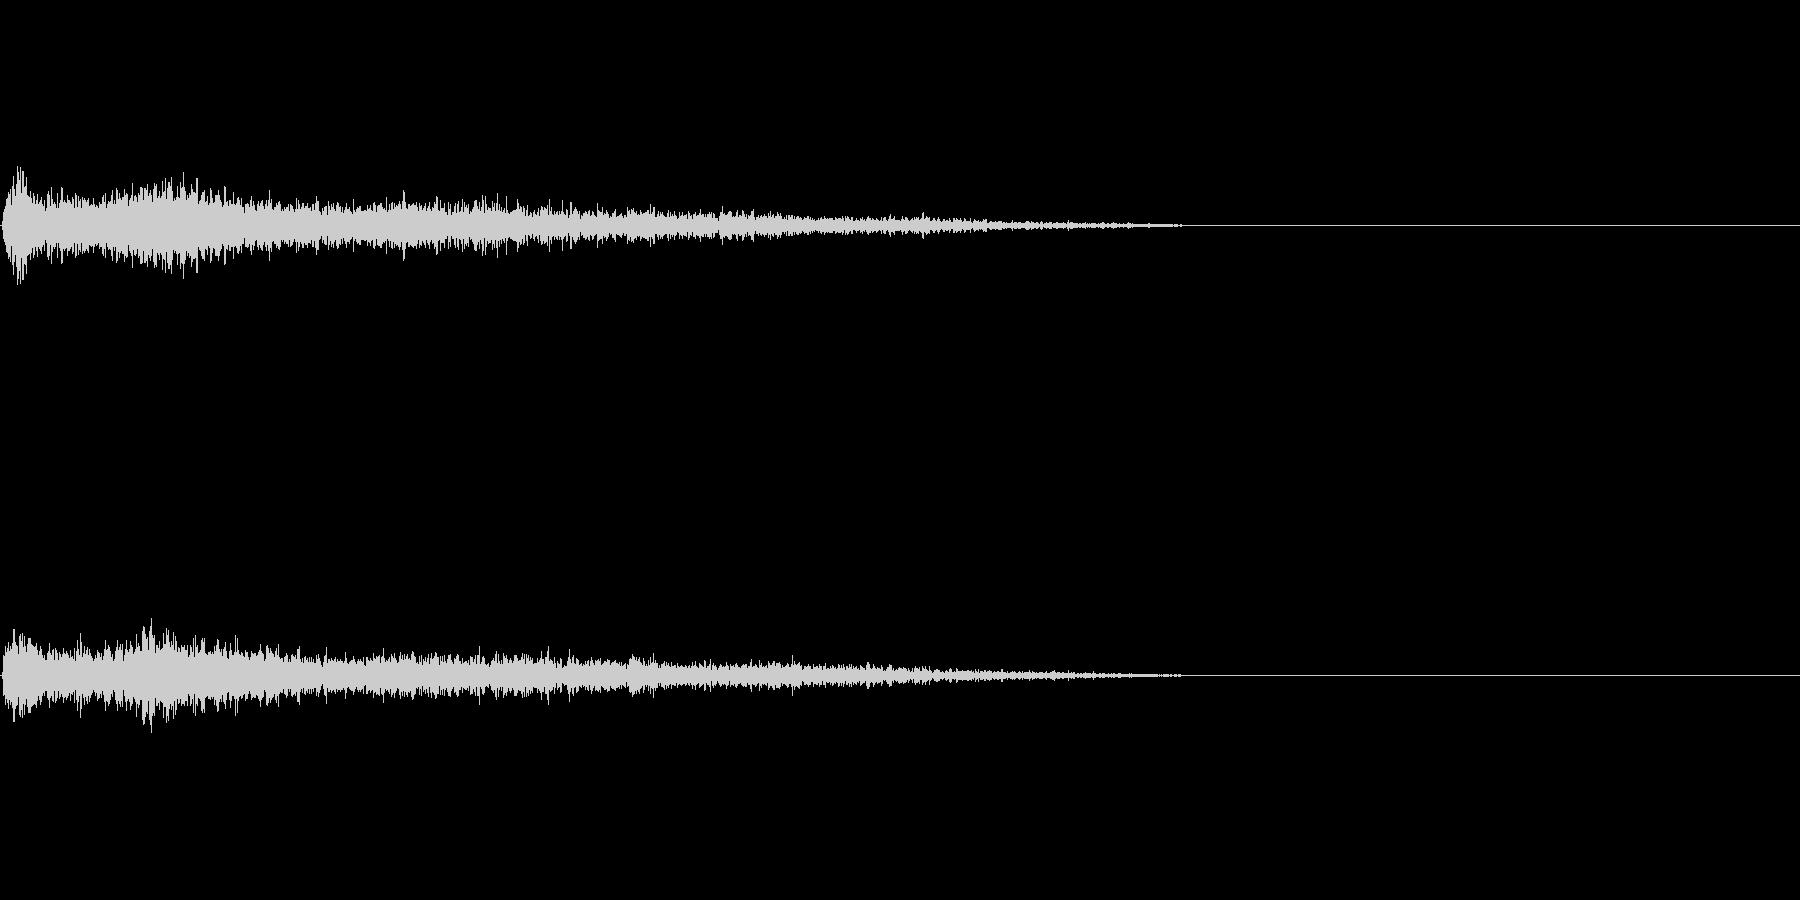 A♯マイナー インパクト音 衝撃音の未再生の波形